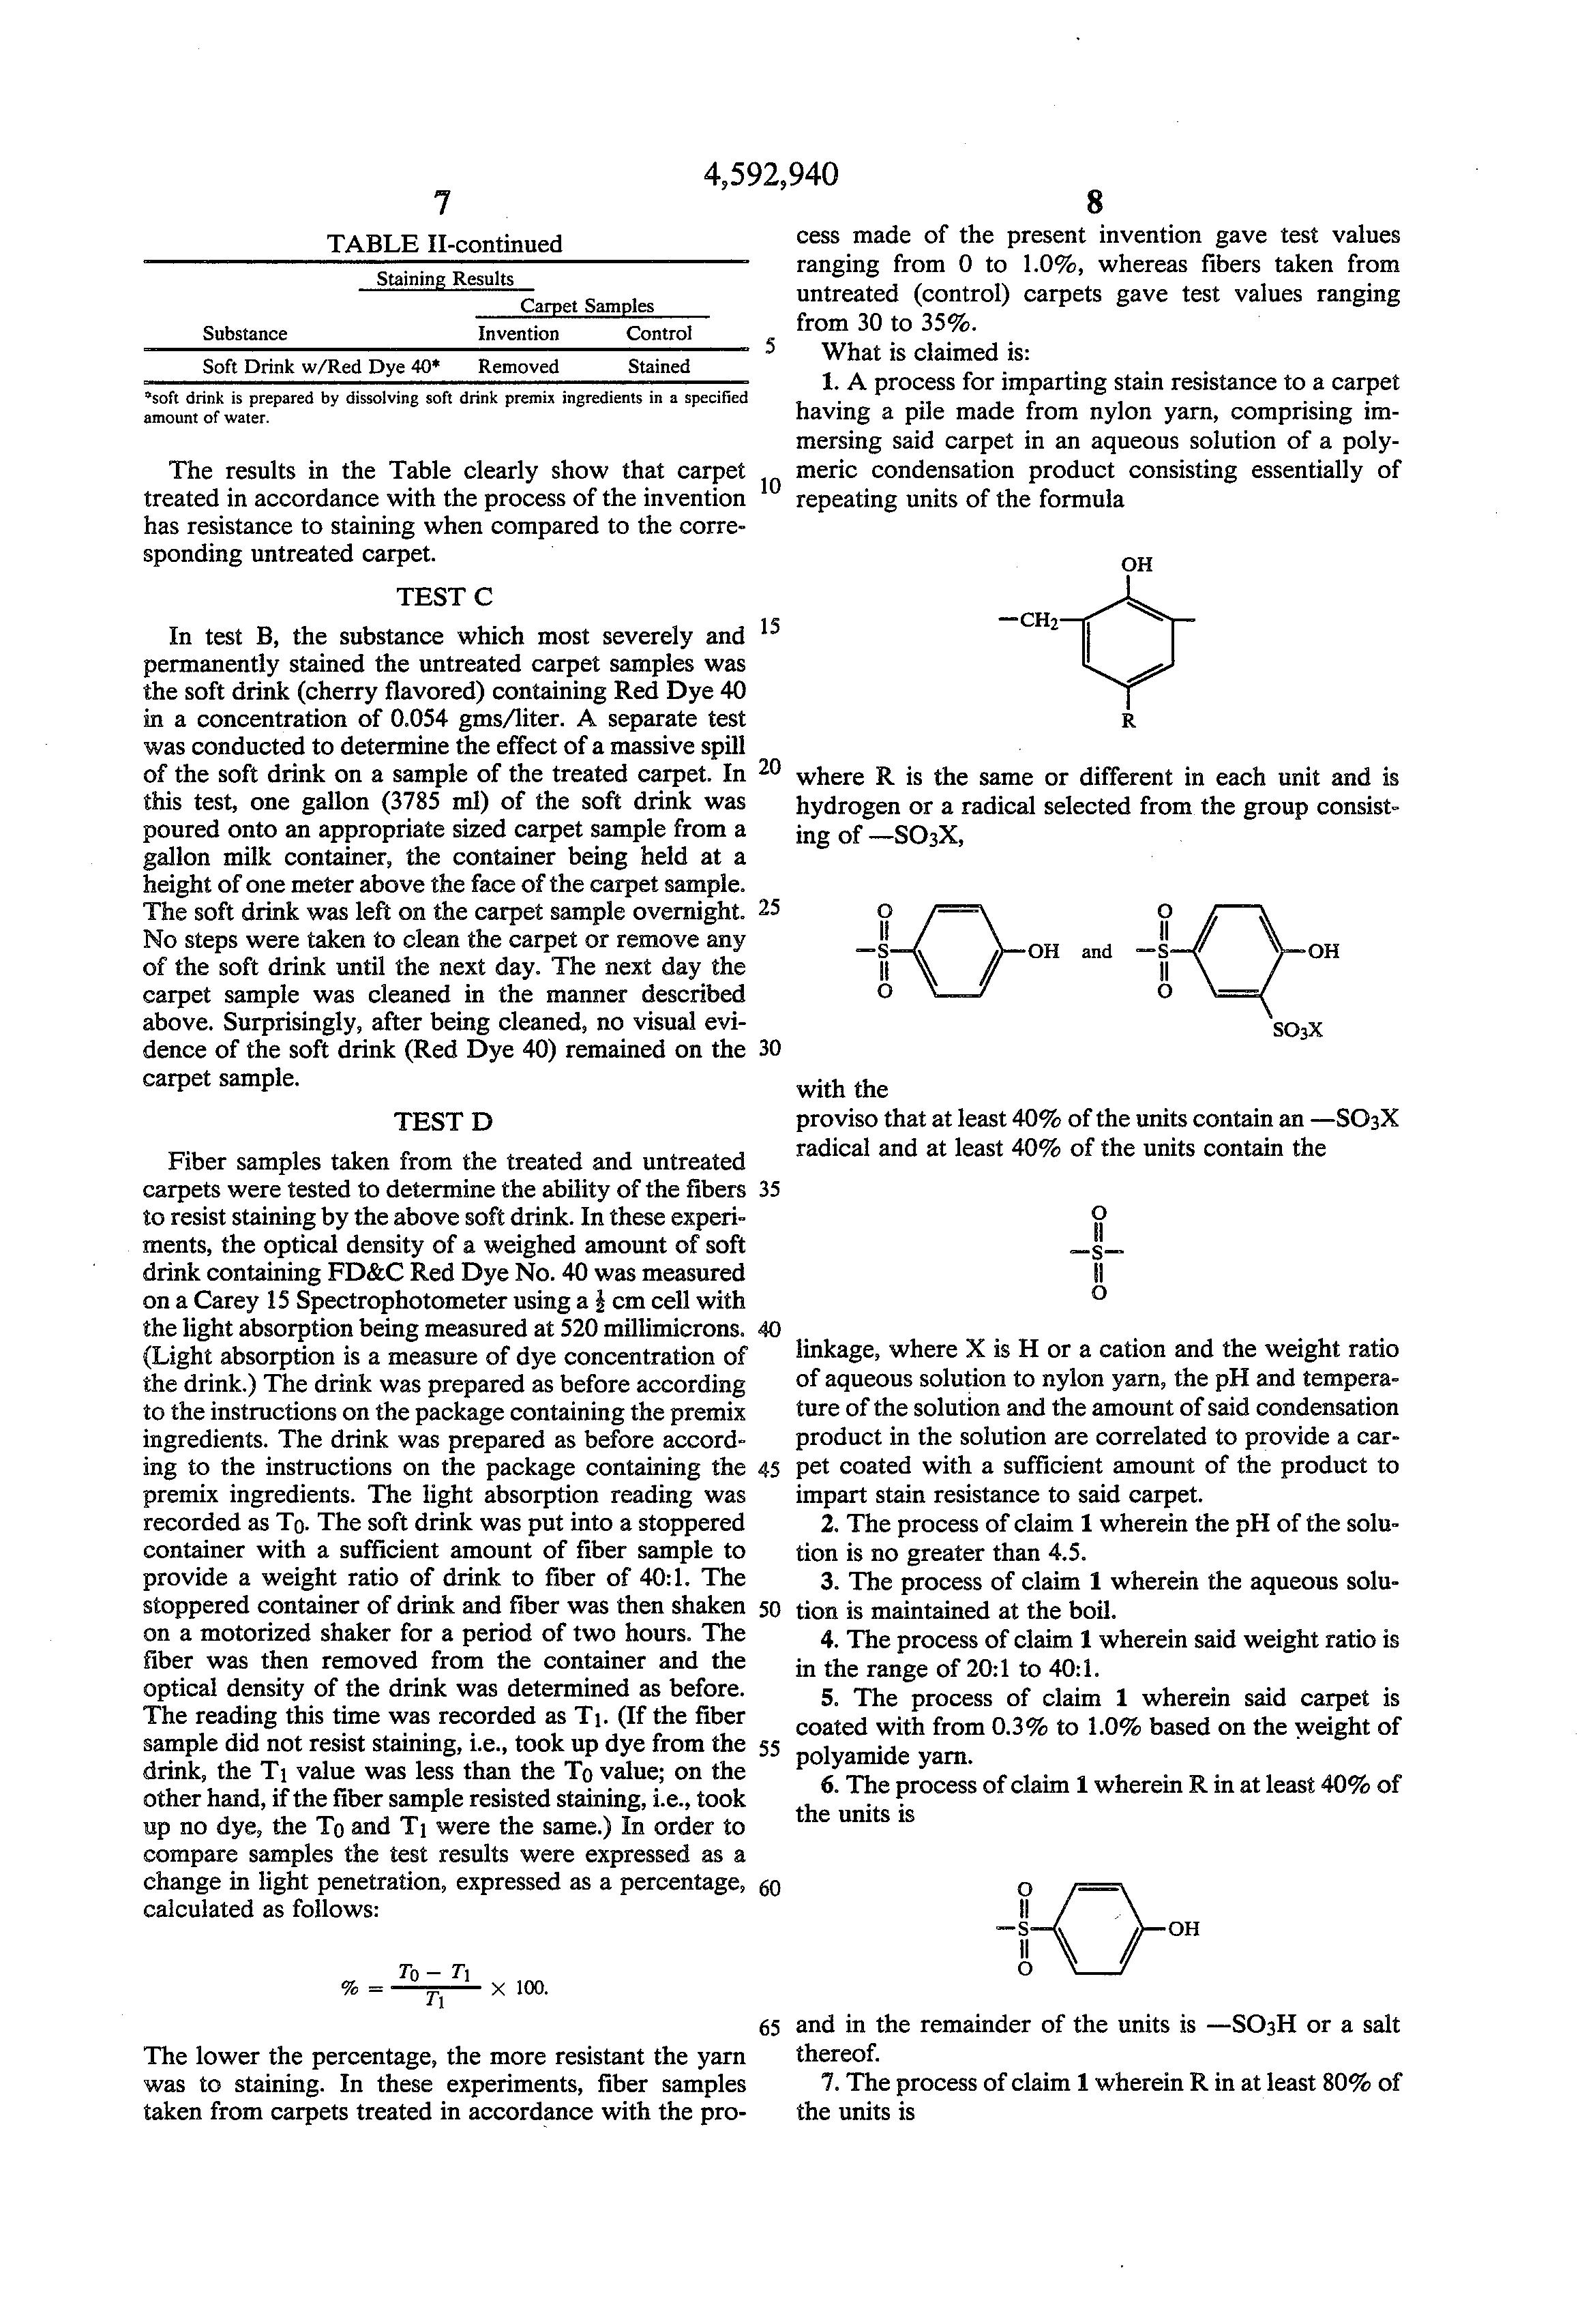 Resistance Nylon Is Less 49